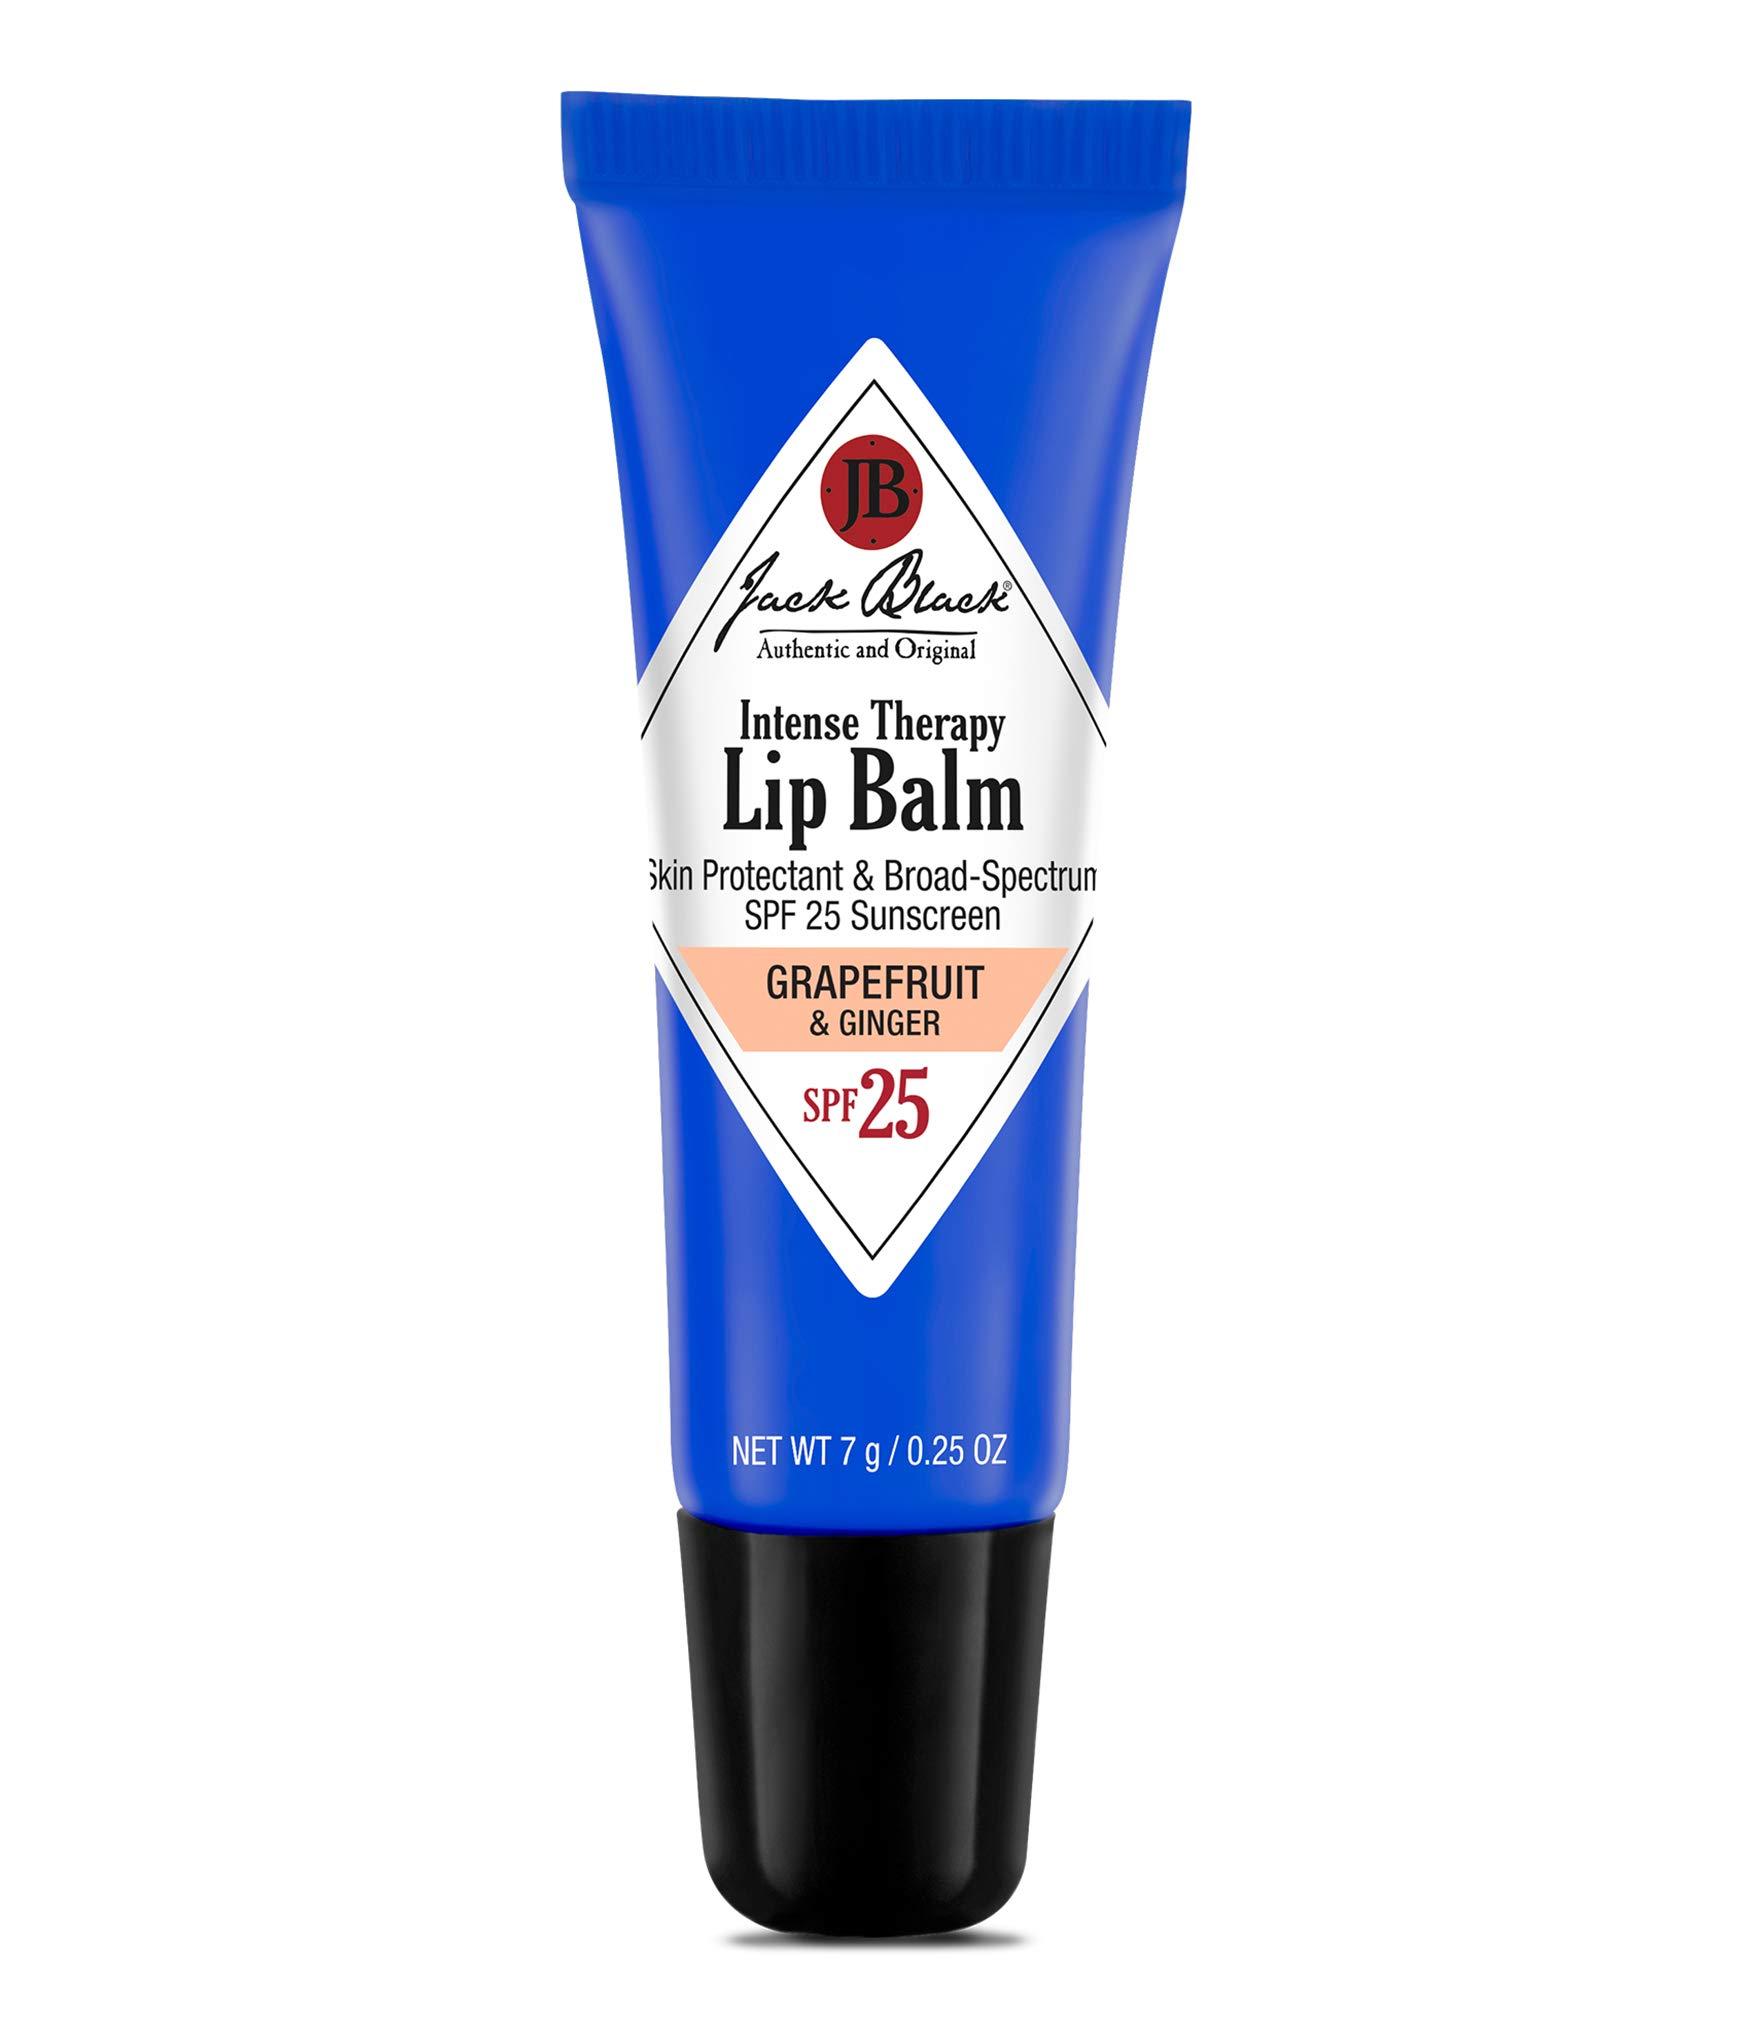 JACK BLACK - Intense Therapy Lip Balm SPF 25 - Green Tea Antioxidants, Long Lasting Treatment, Broad-Spectrum UVA and UVB Protection, Grapefruit & Ginger Flavor, 0.25 oz.